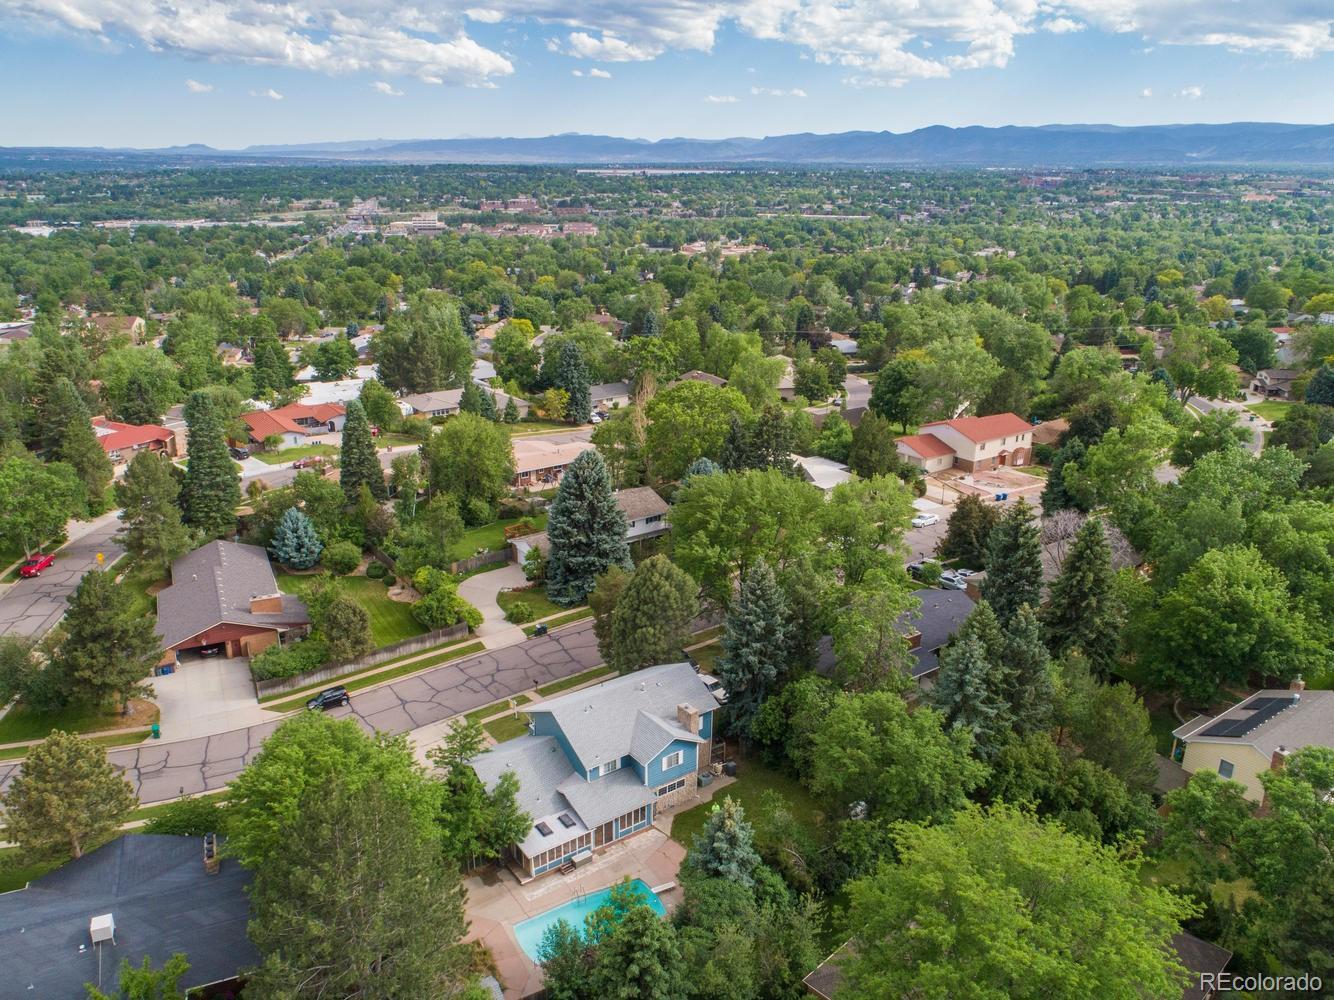 MLS# 7626152 - 37 - 2617 S Depew Place, Lakewood, CO 80227